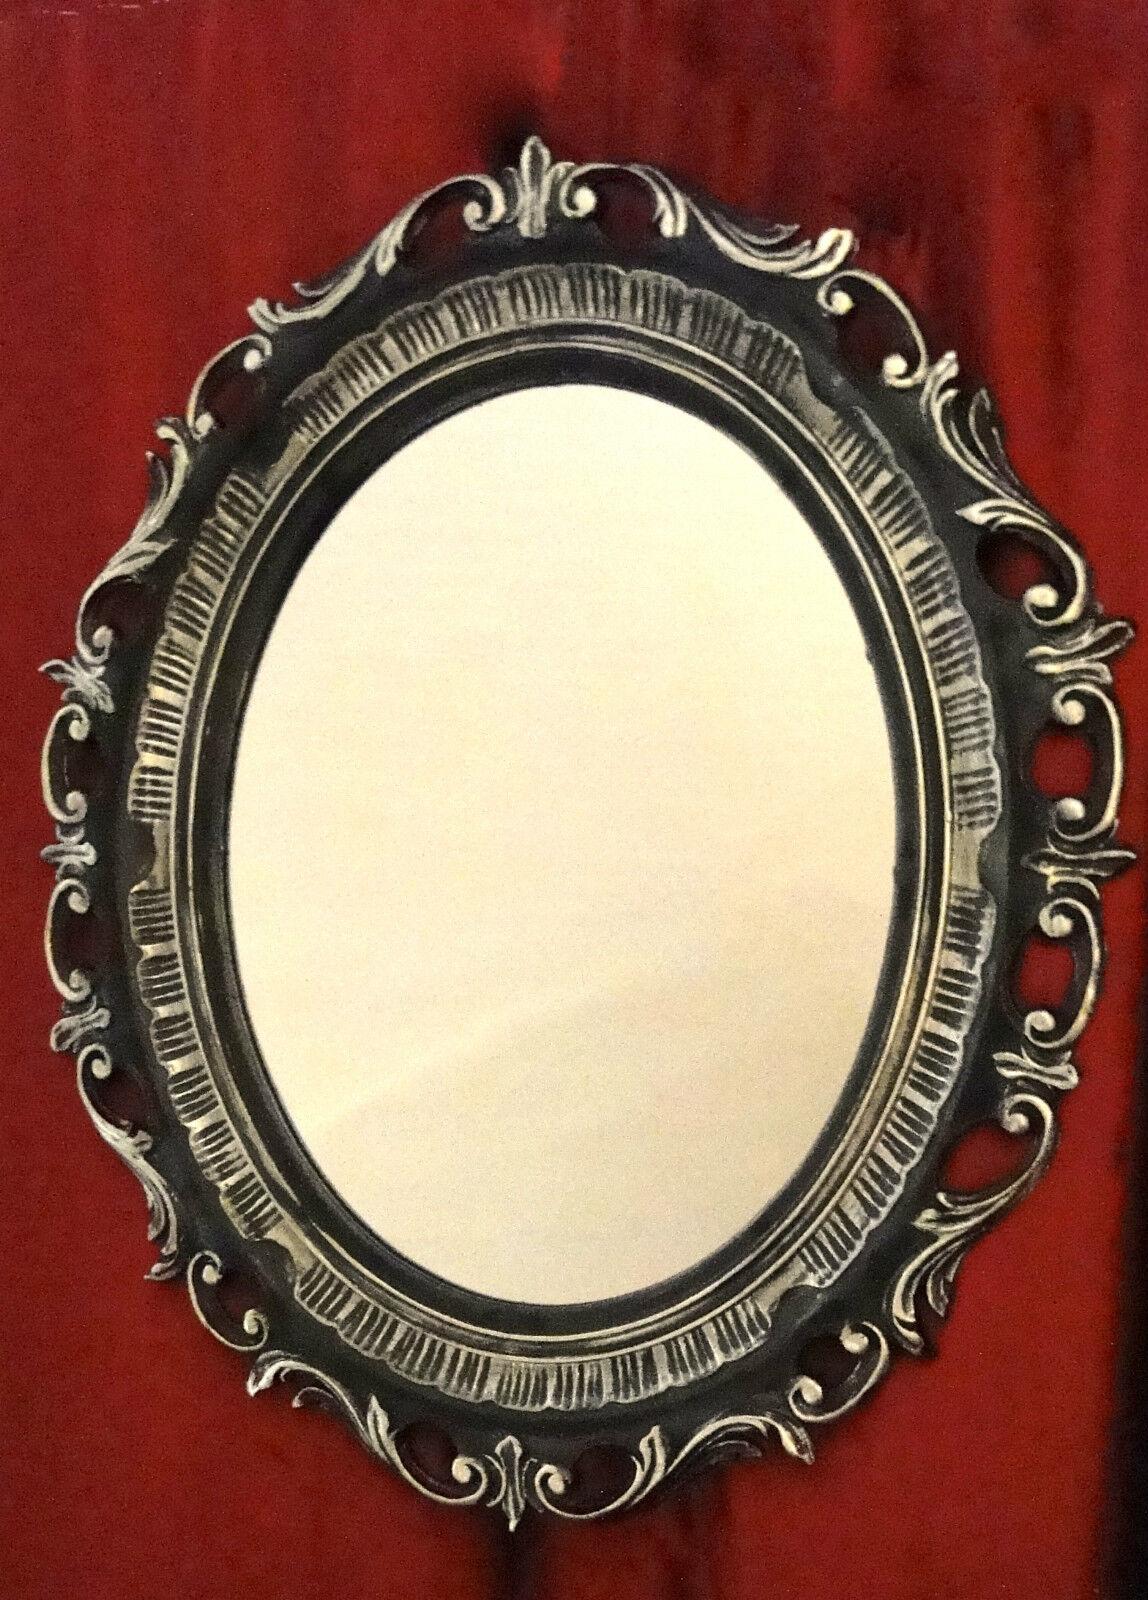 Bilderrahmen oval wei silber barock antik rahmen 58x68 for Spiegel oval mit rahmen